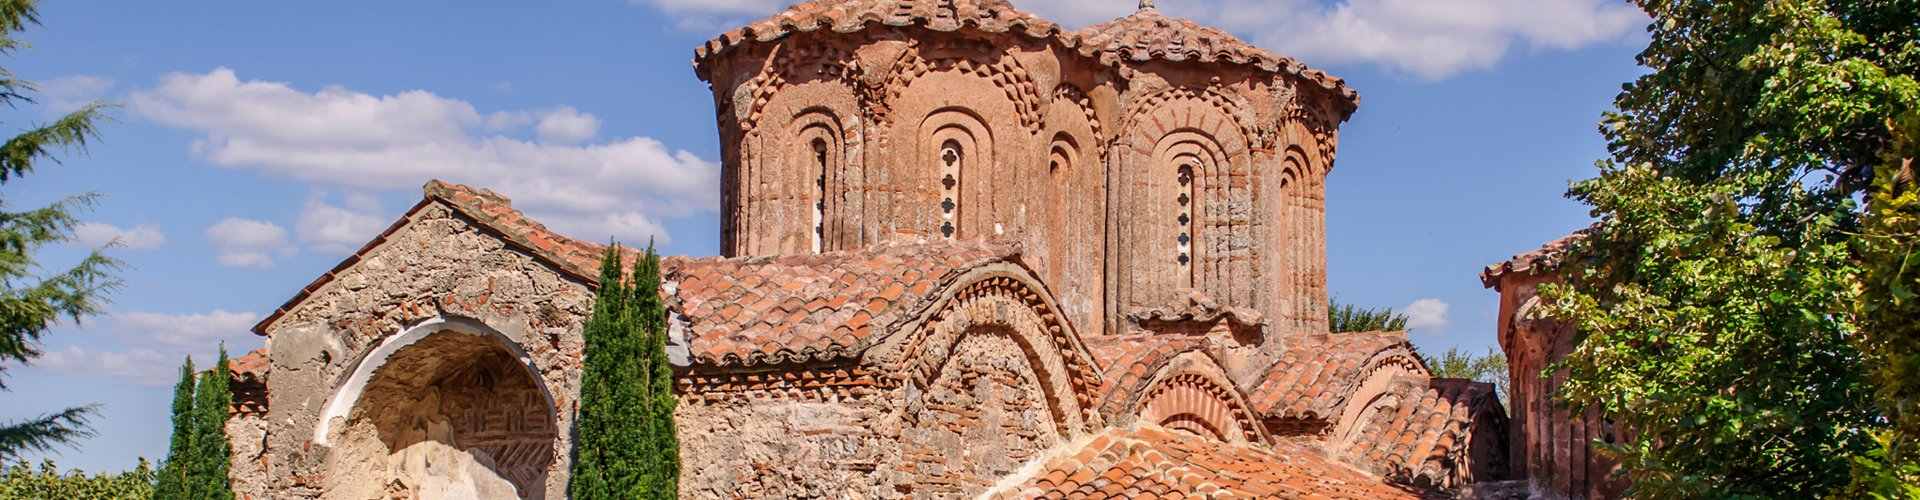 Klooster, Macedonië